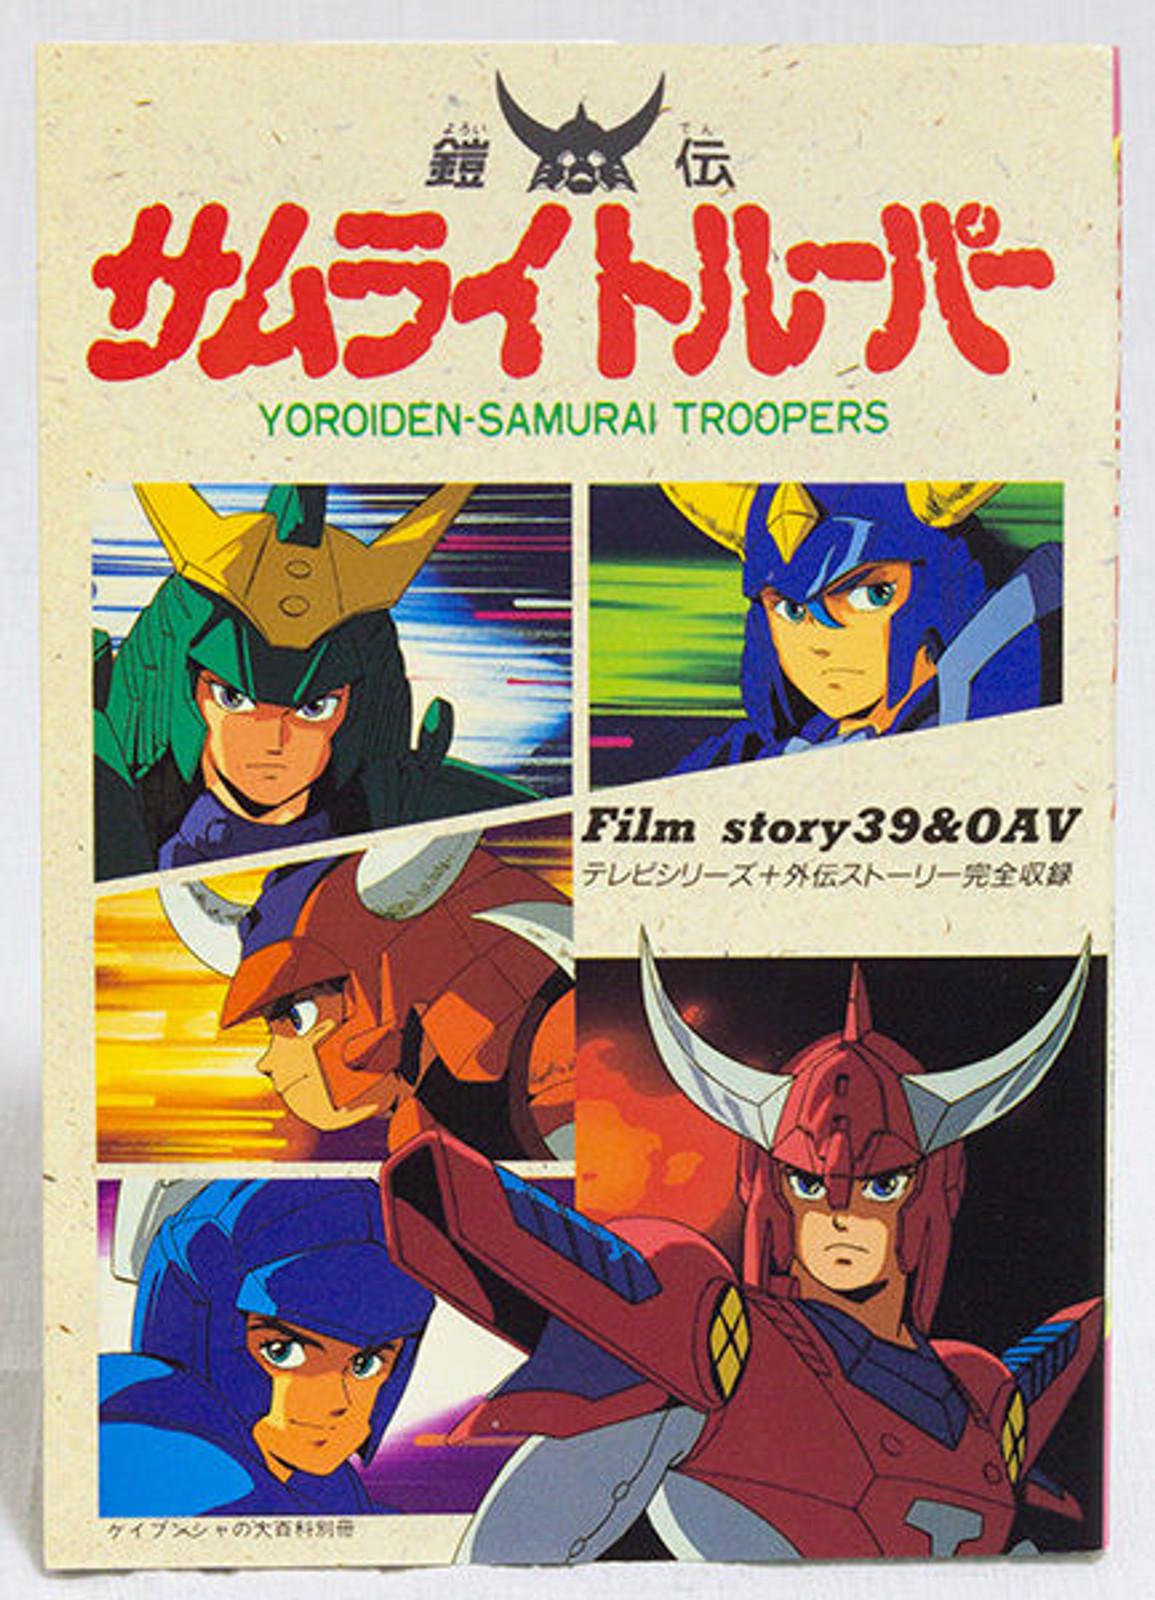 Samurai Troopers Film Story 39 and OAV Art Book Ronin Warriors JAPAN ANIME